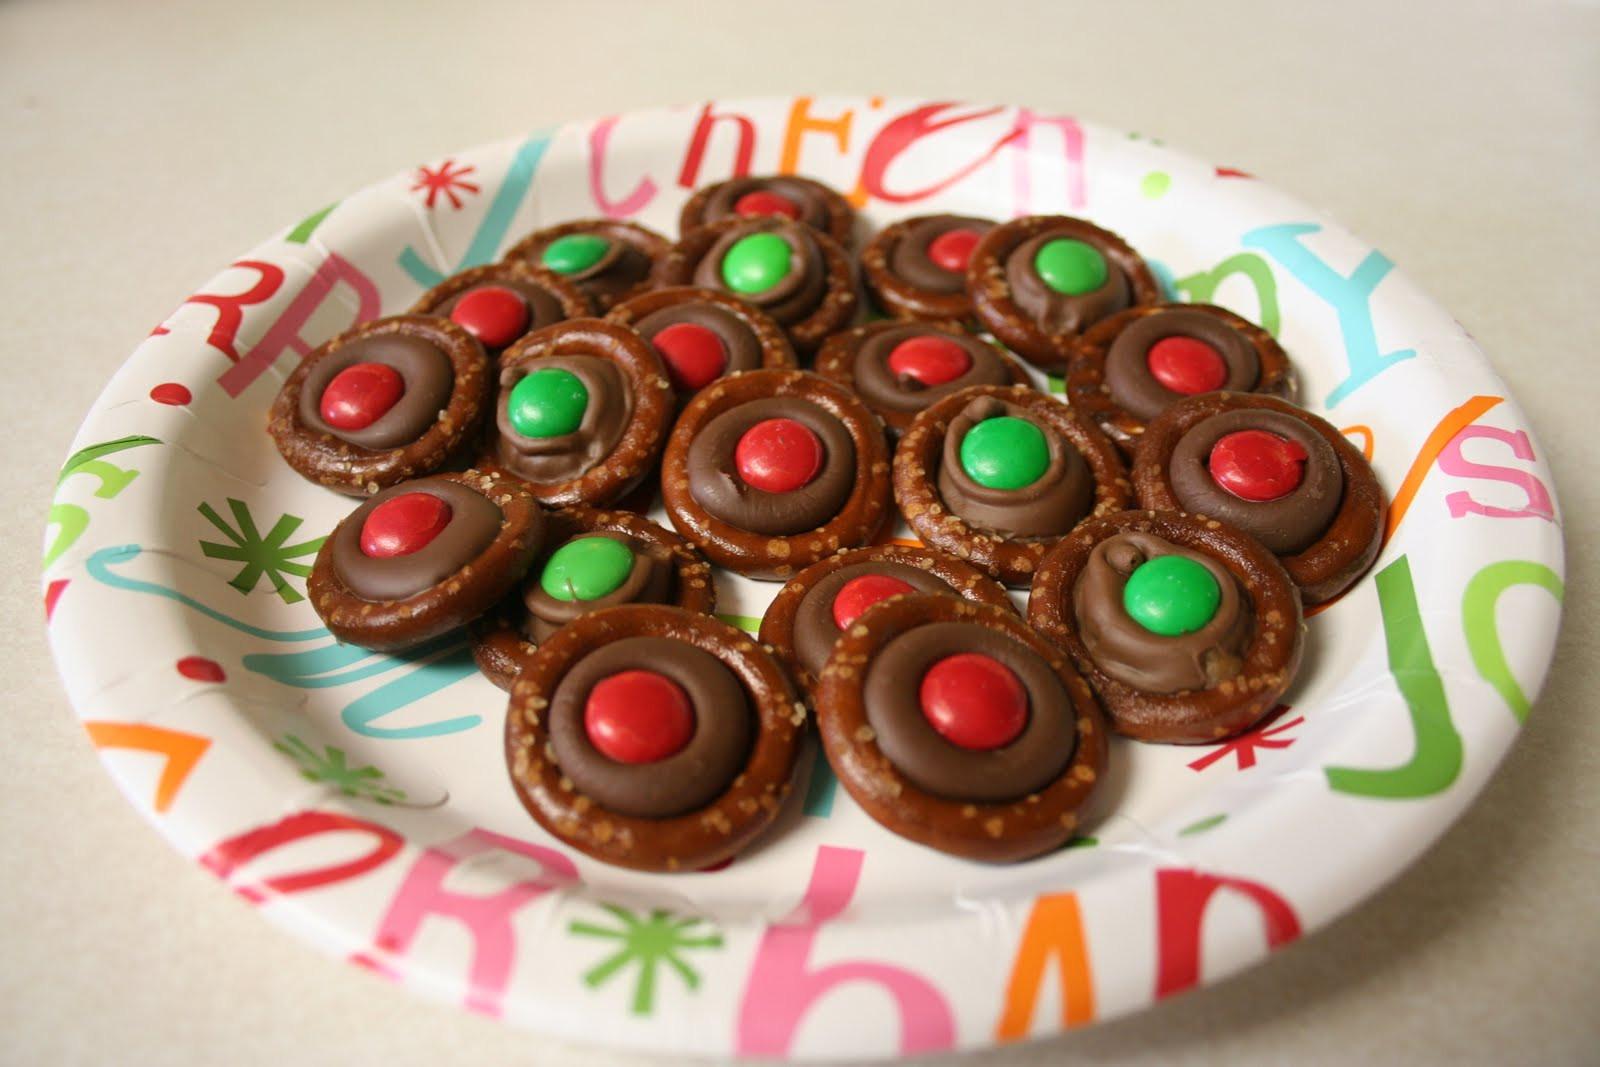 Christmas Pretzels Recipe  Chelsea Gets Married Christmas Recipe 1 Chocolate